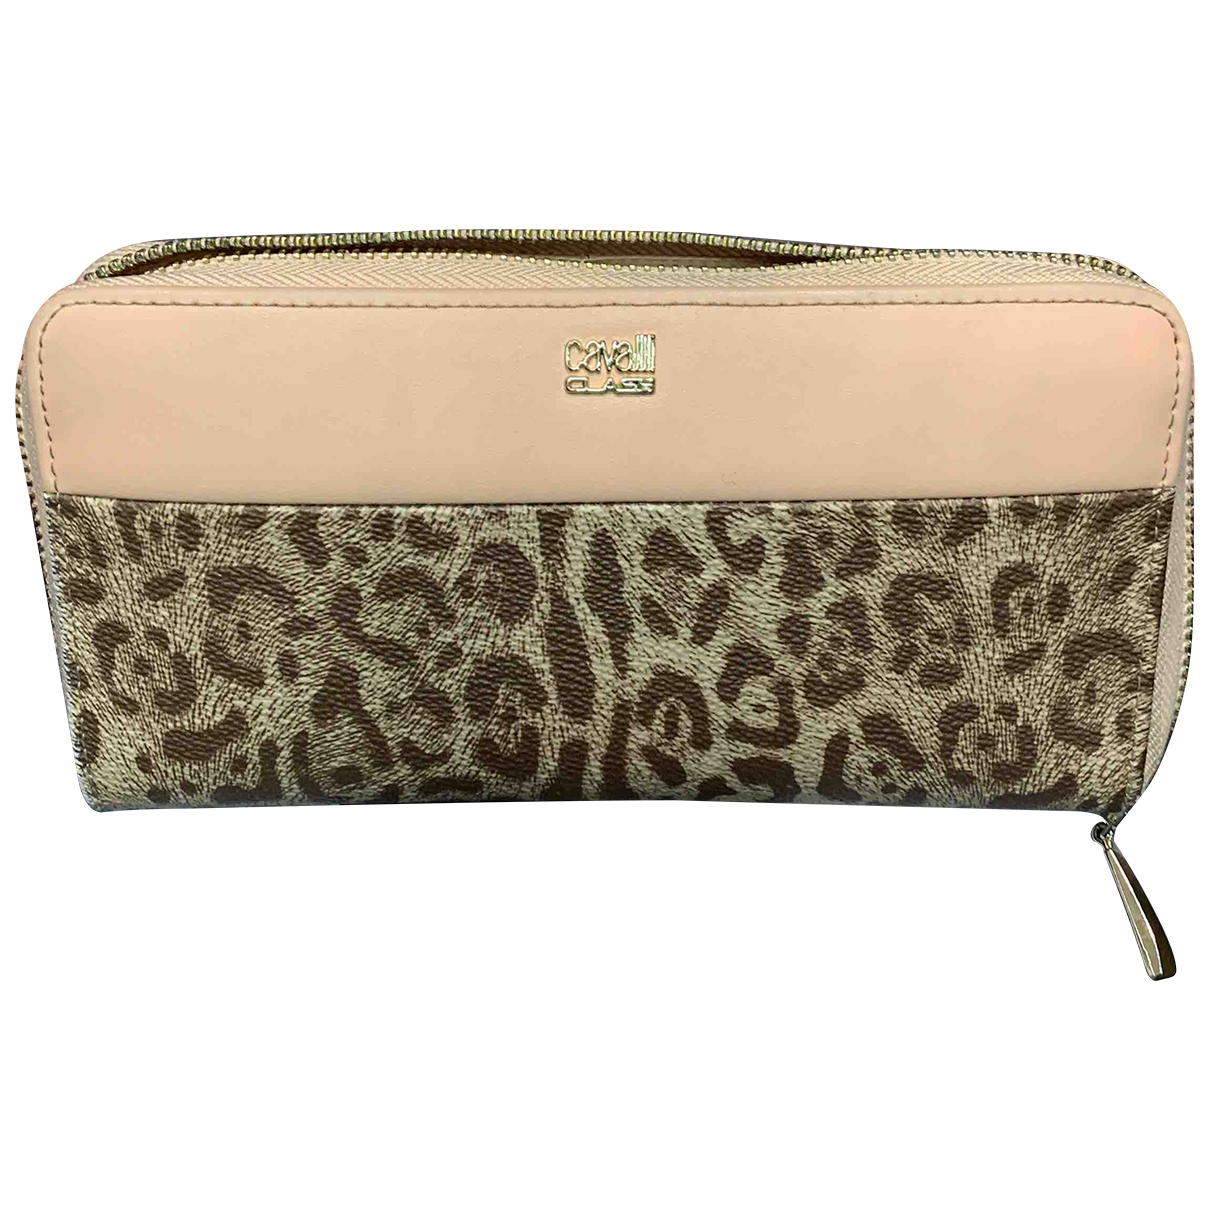 Roberto Cavalli N Pink Leather wallet for Women N